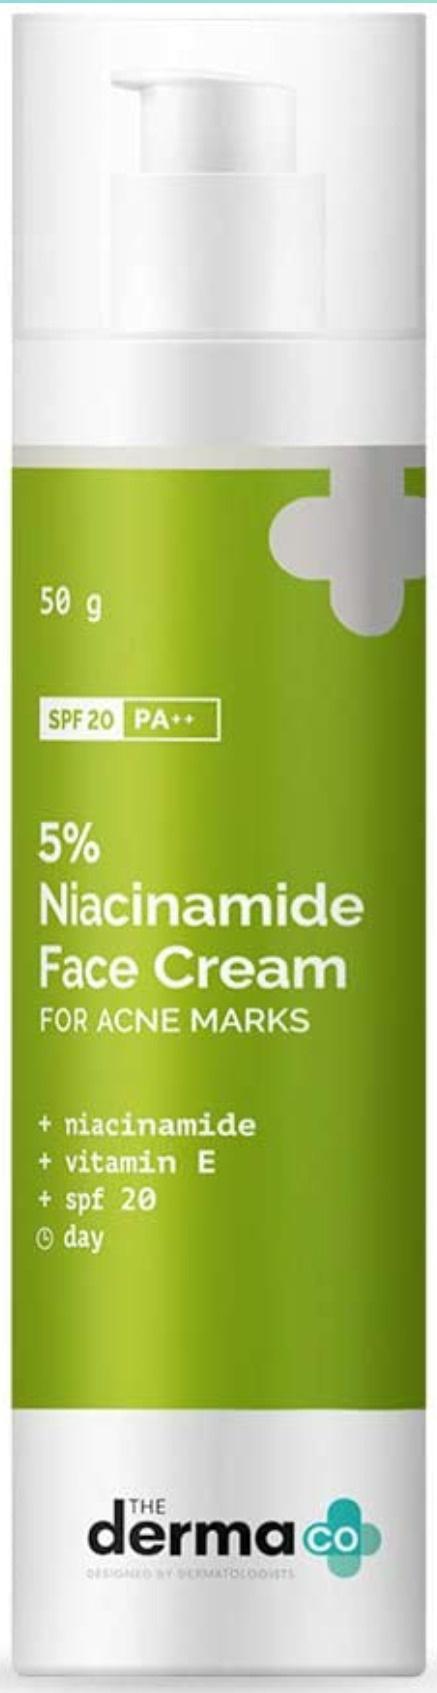 The derma CO Niacinamide Cream SPF 20 Pa ++